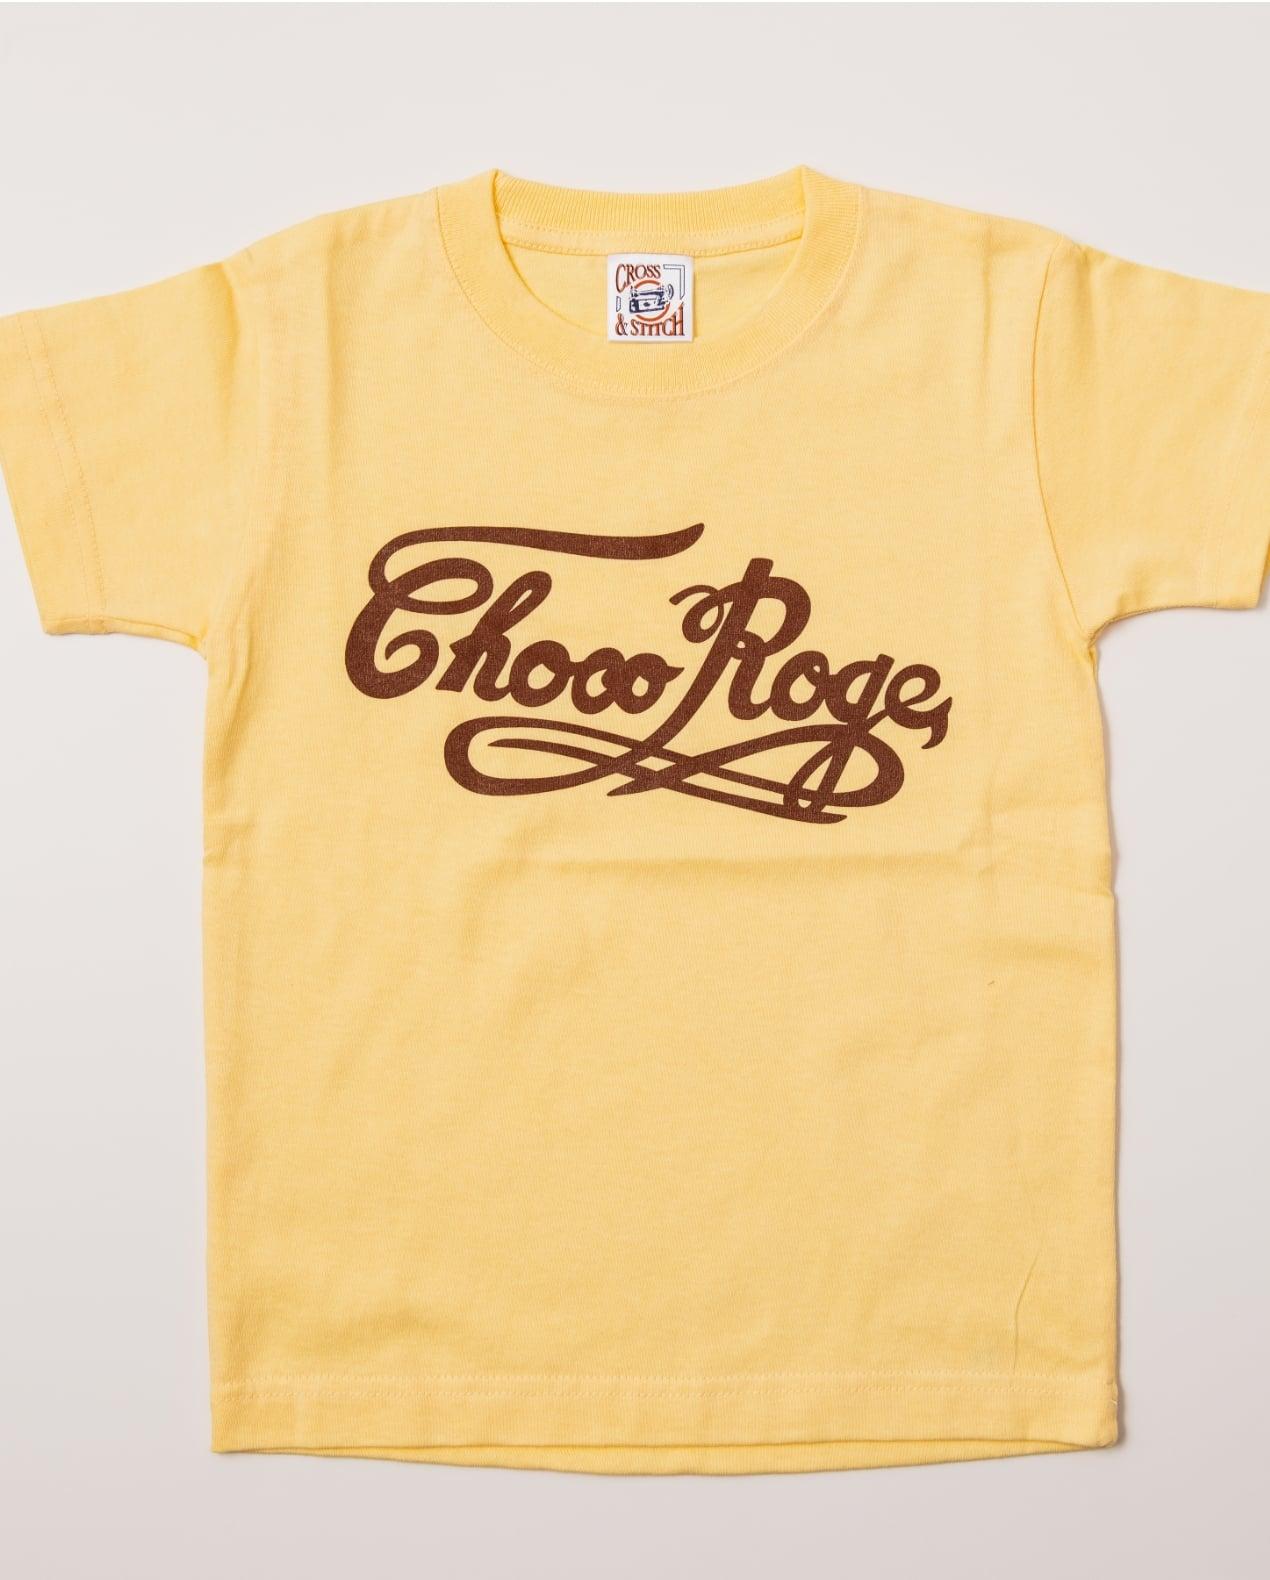 Tシャツ 大人用 黄色 サイズM